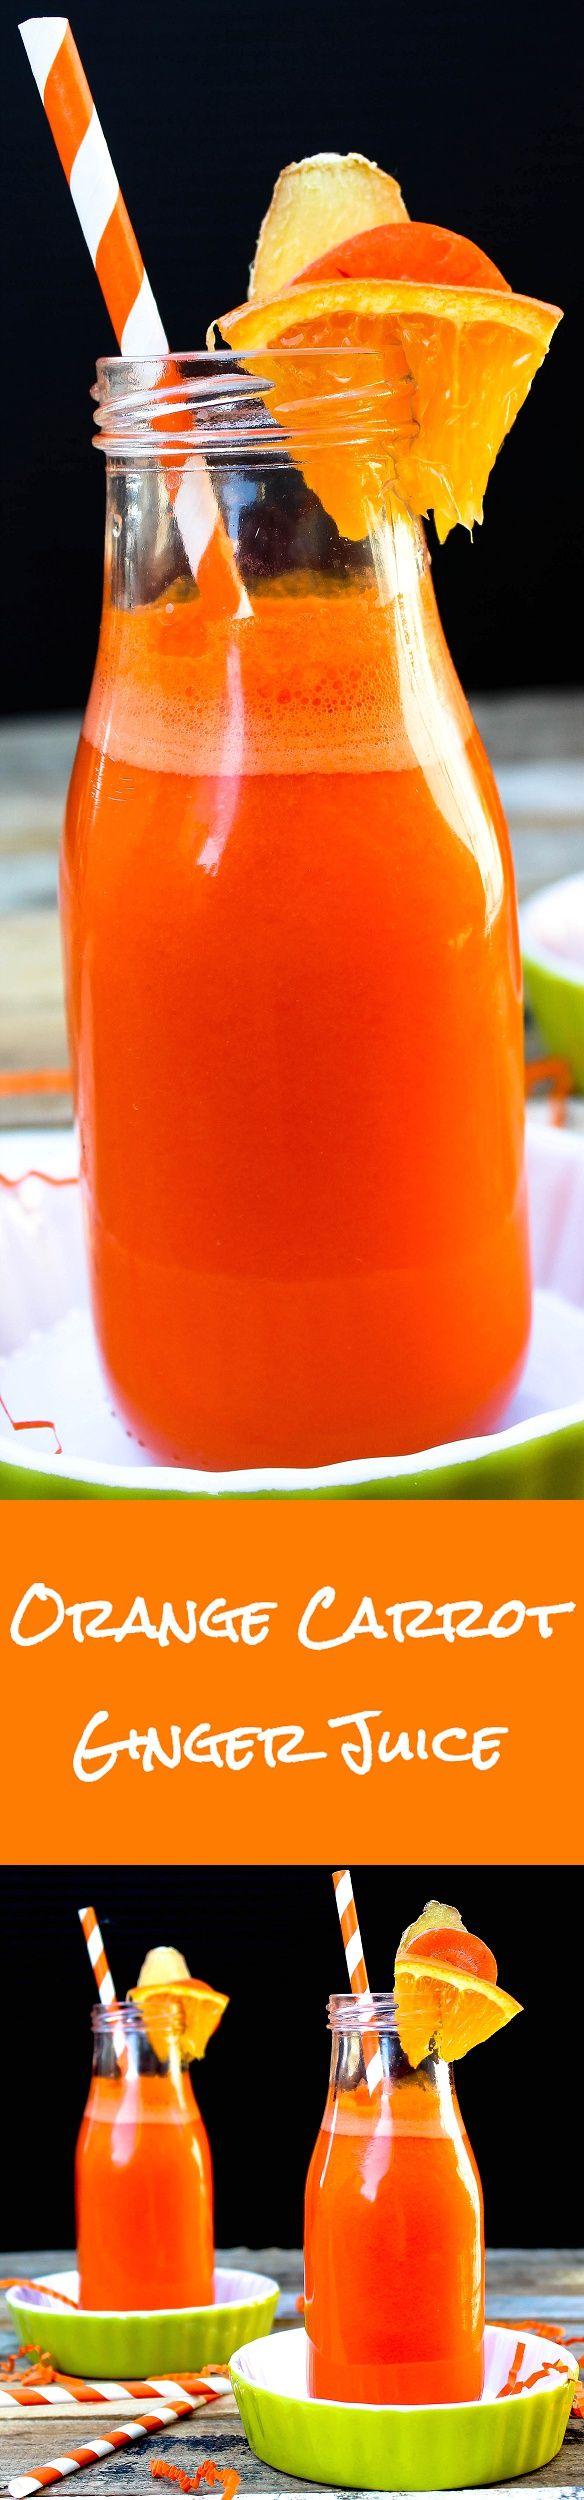 Orange Carrot Ginger Juice - http://veganhuggs.com/orange-drank/